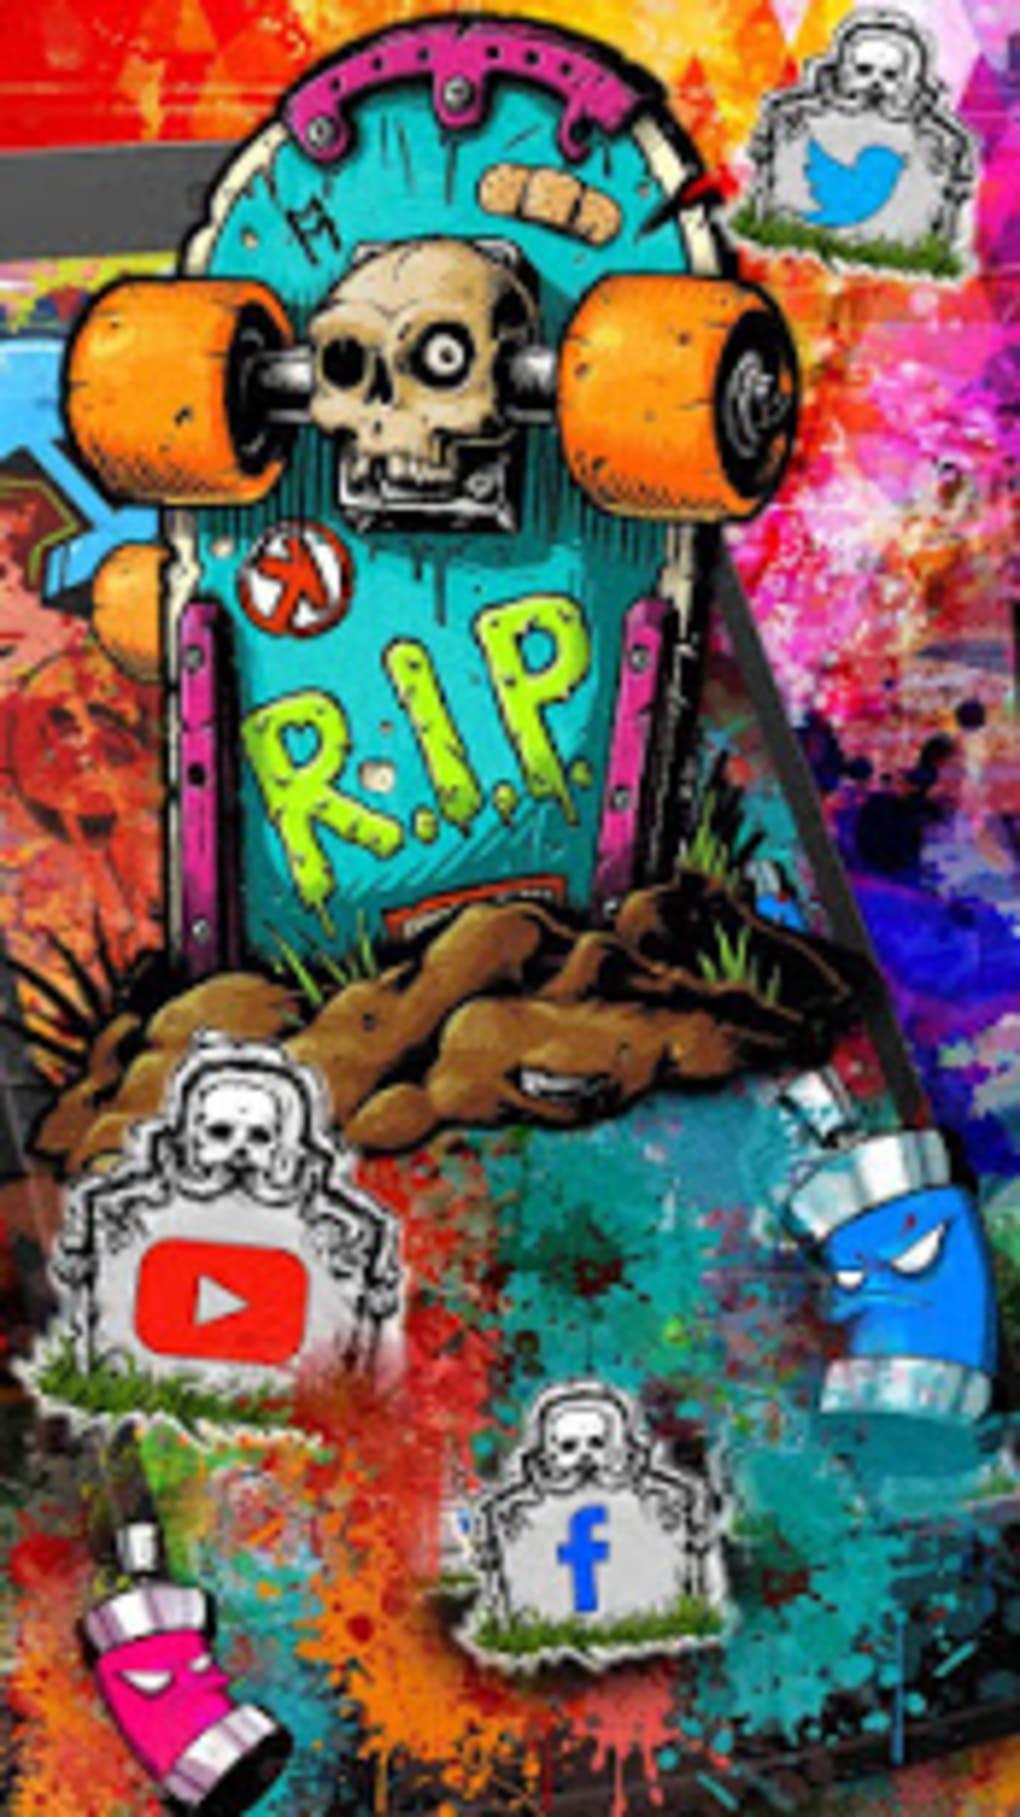 Free Graffiti Skate Themes HD Wallpapers 3D Icons